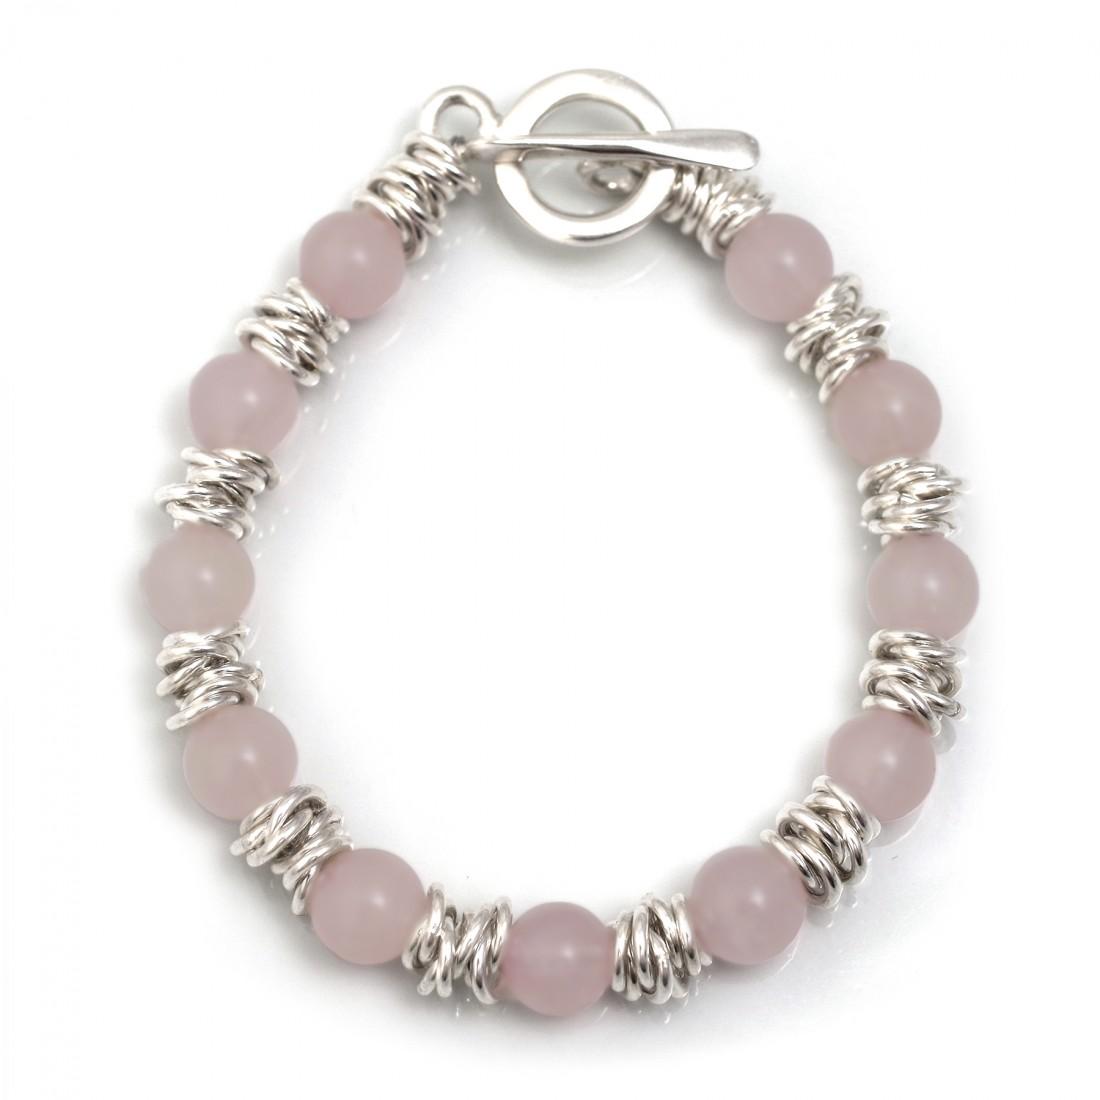 Classic Sterling Silver Multi-Links & Rose Quartz Bracelet